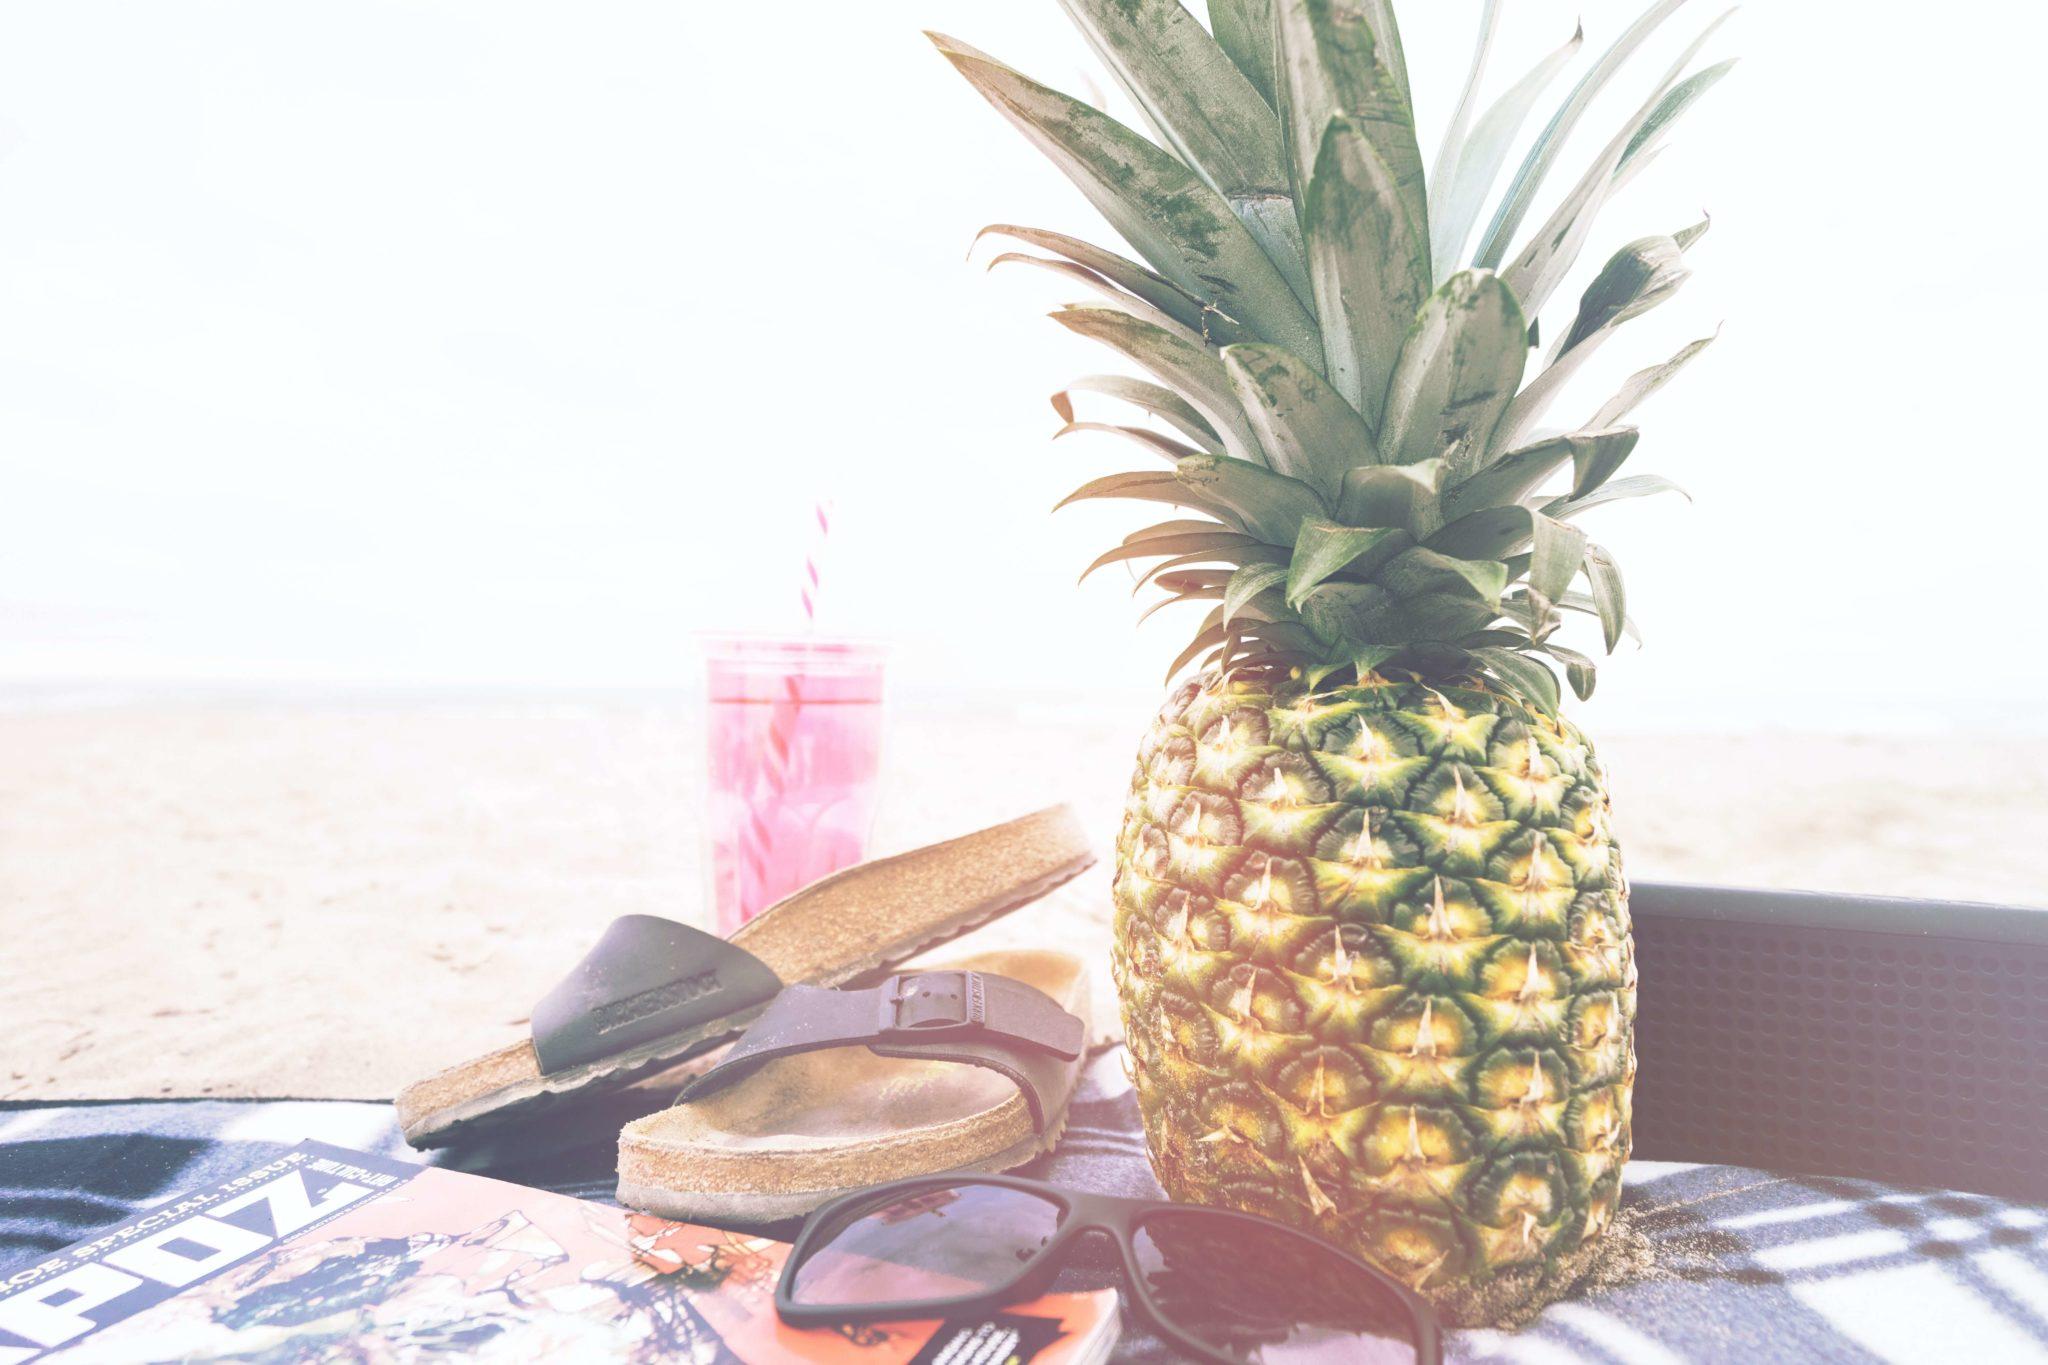 Klapki i ananas